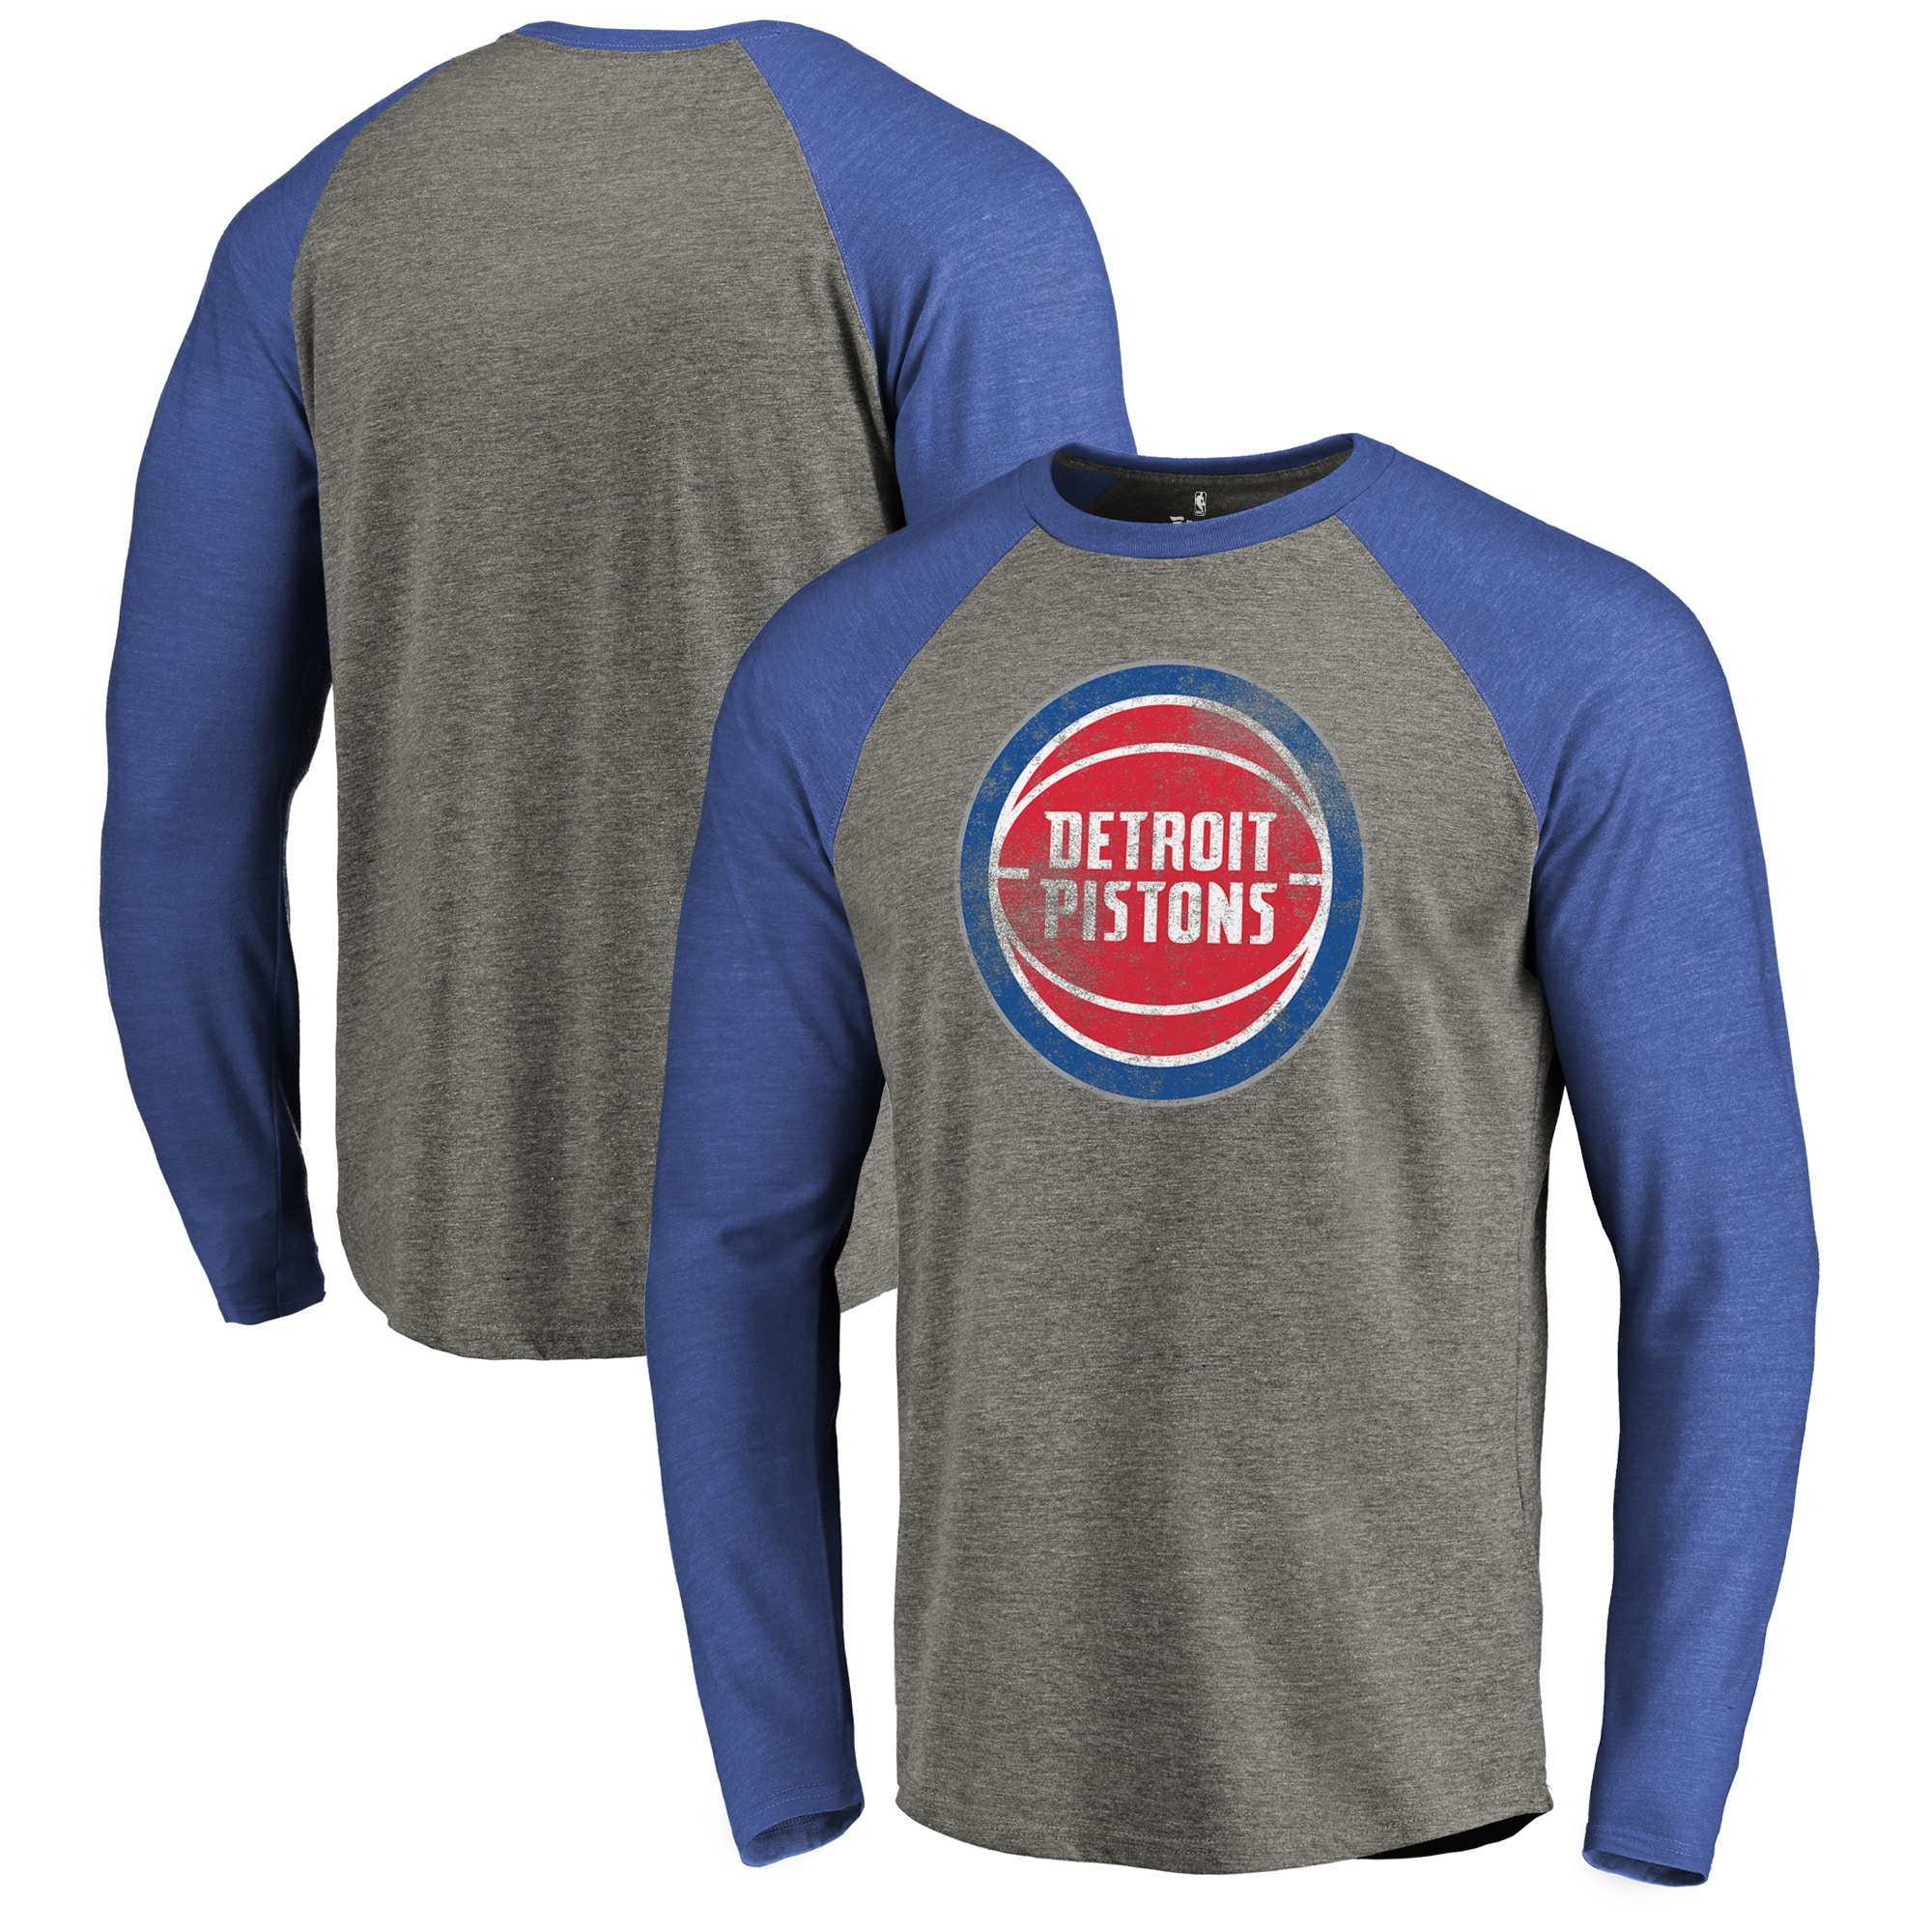 Detroit Pistons Fanatics Branded Distressed Logo Tri-Blend Raglan Long Sleeve T-Shirt - Ash/Royal